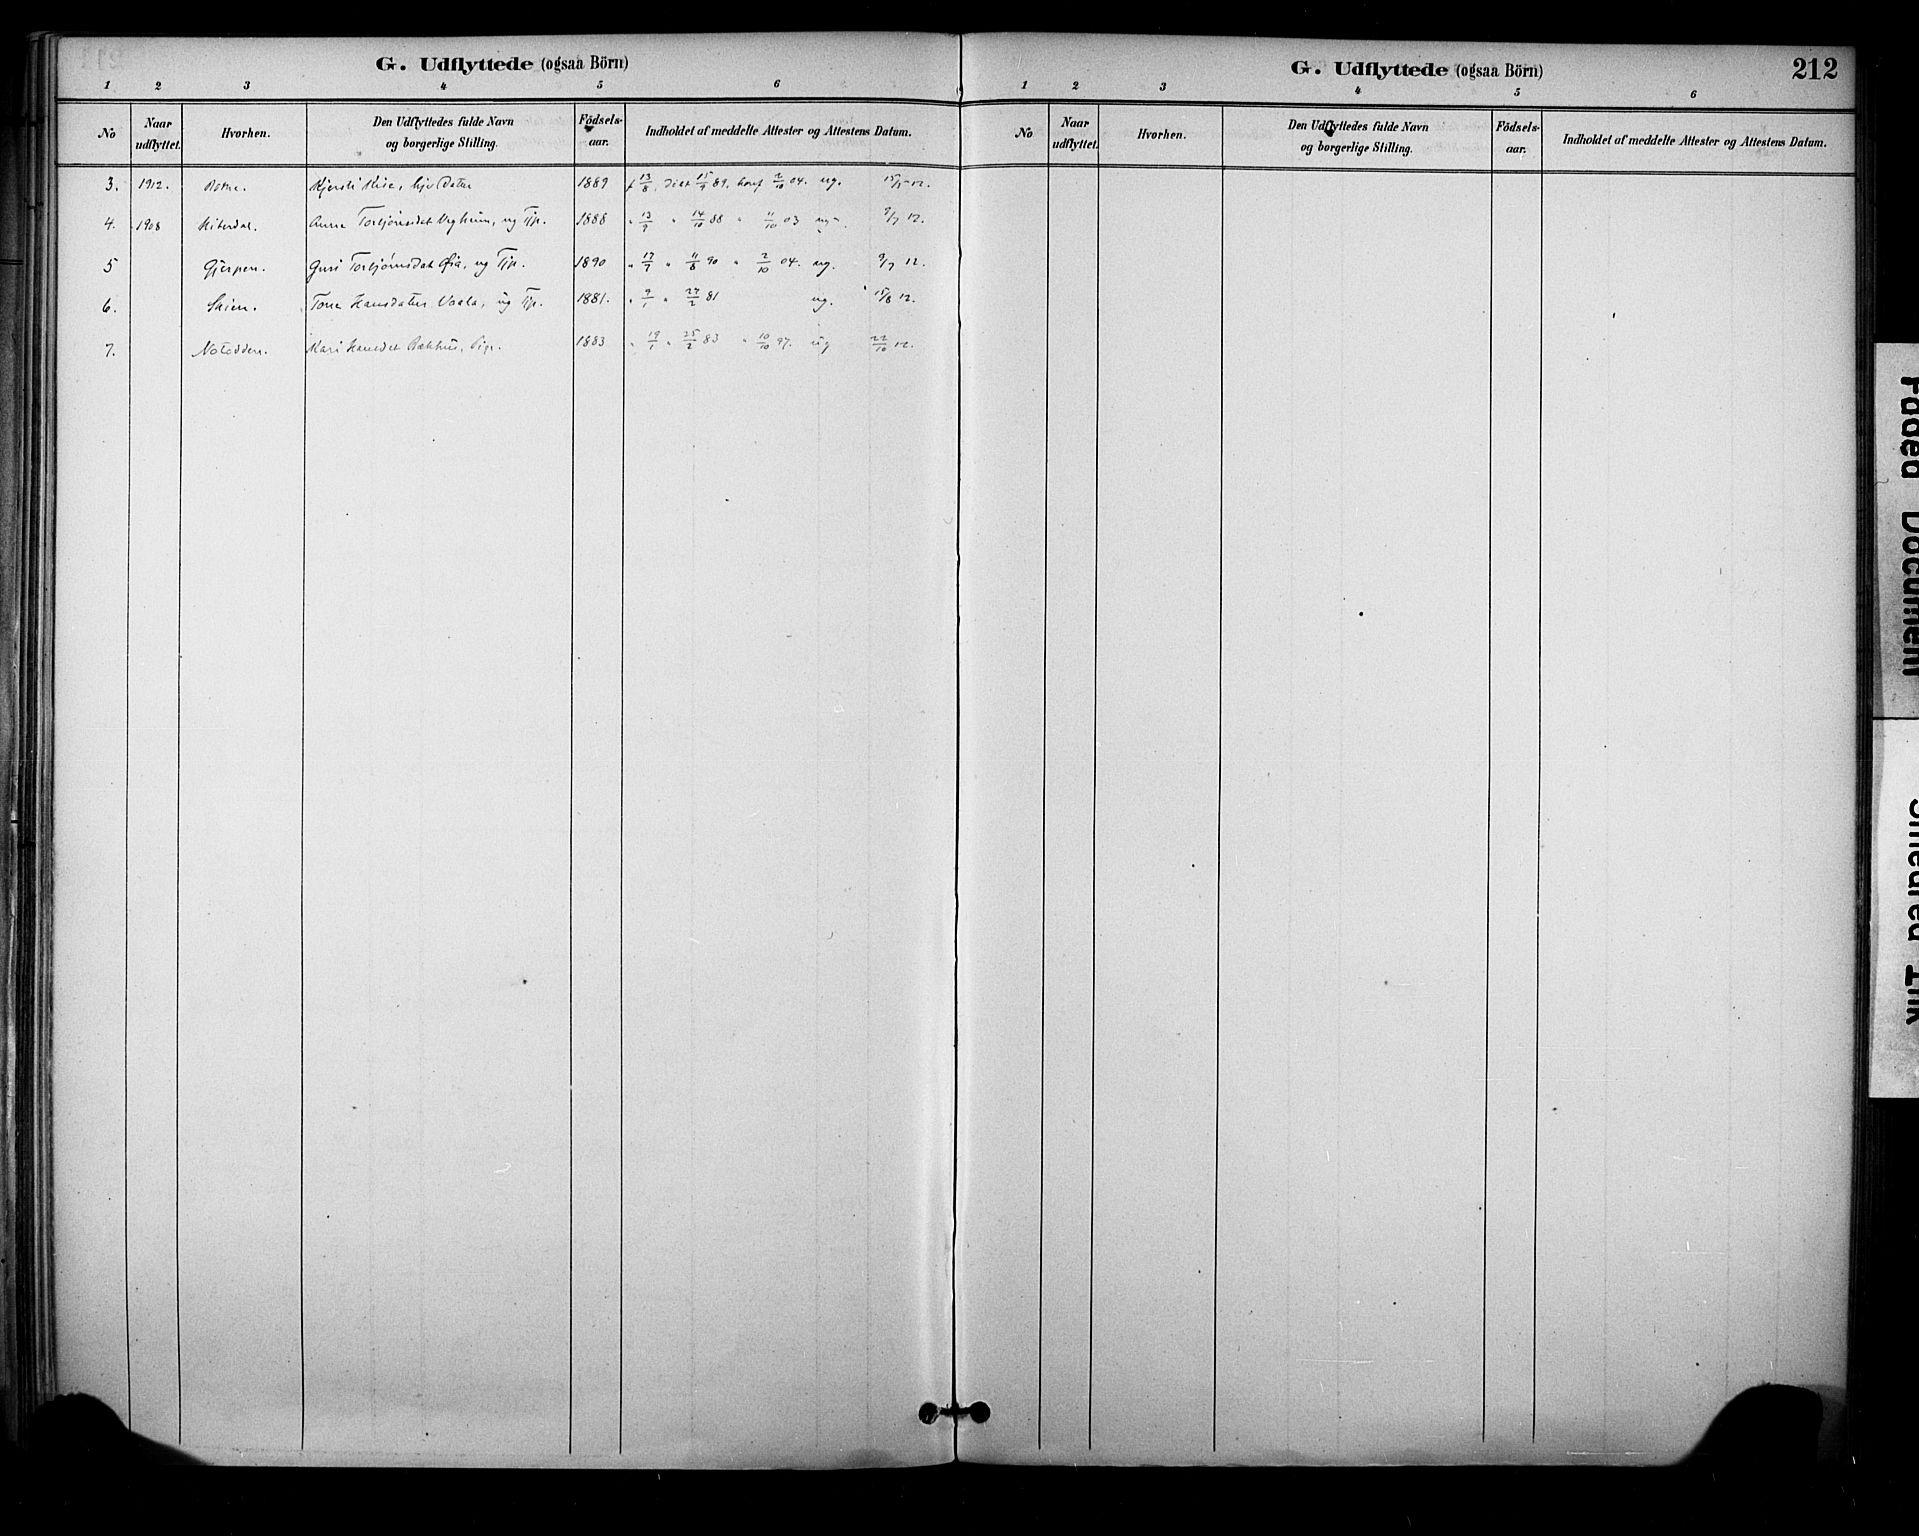 SAKO, Sauherad kirkebøker, F/Fa/L0009: Ministerialbok nr. I 9, 1887-1912, s. 212